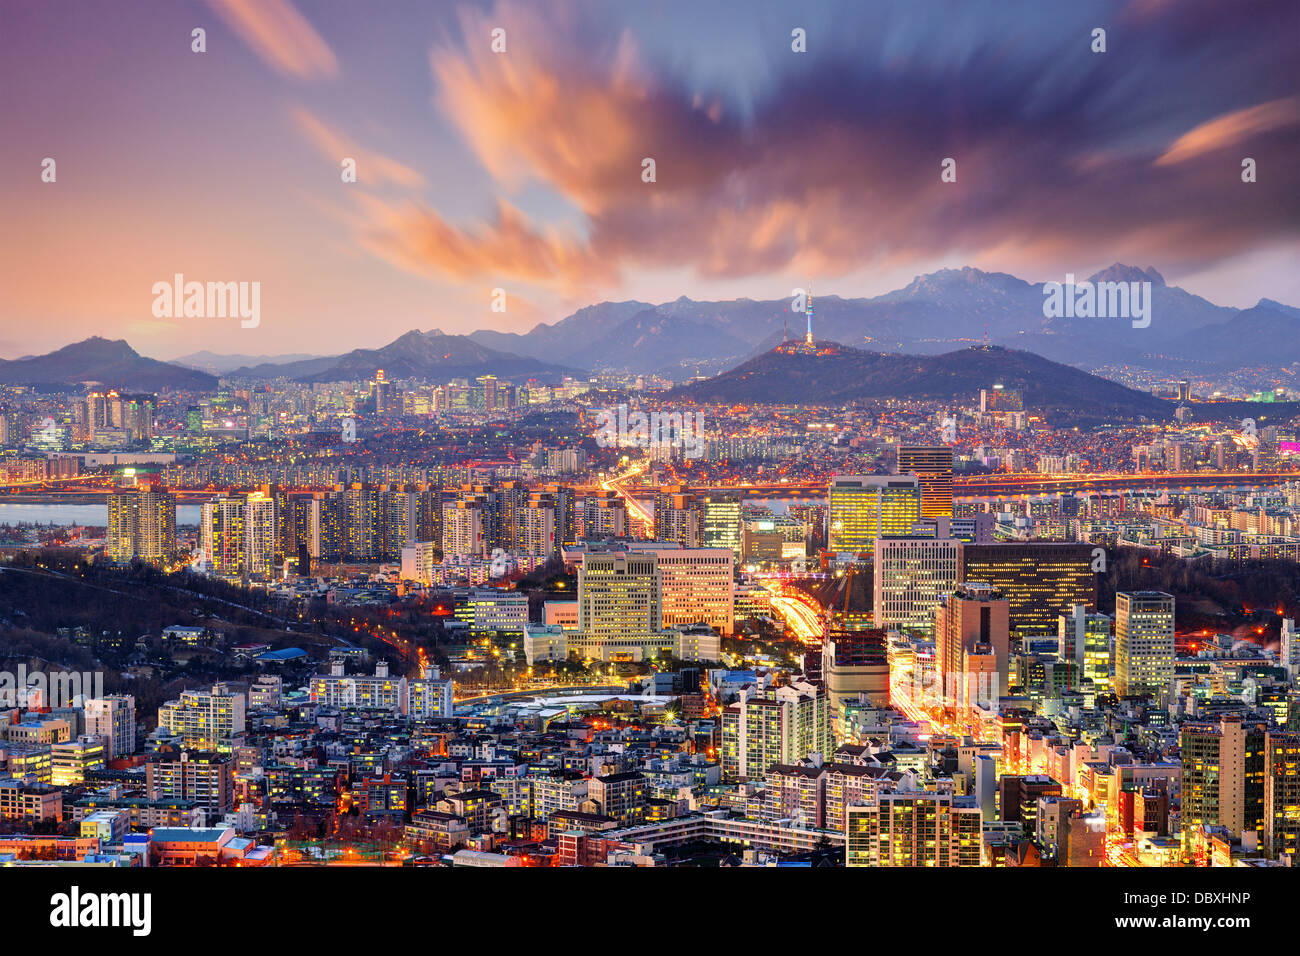 Downtown Seoul, South Korea, USA. - Stock Image